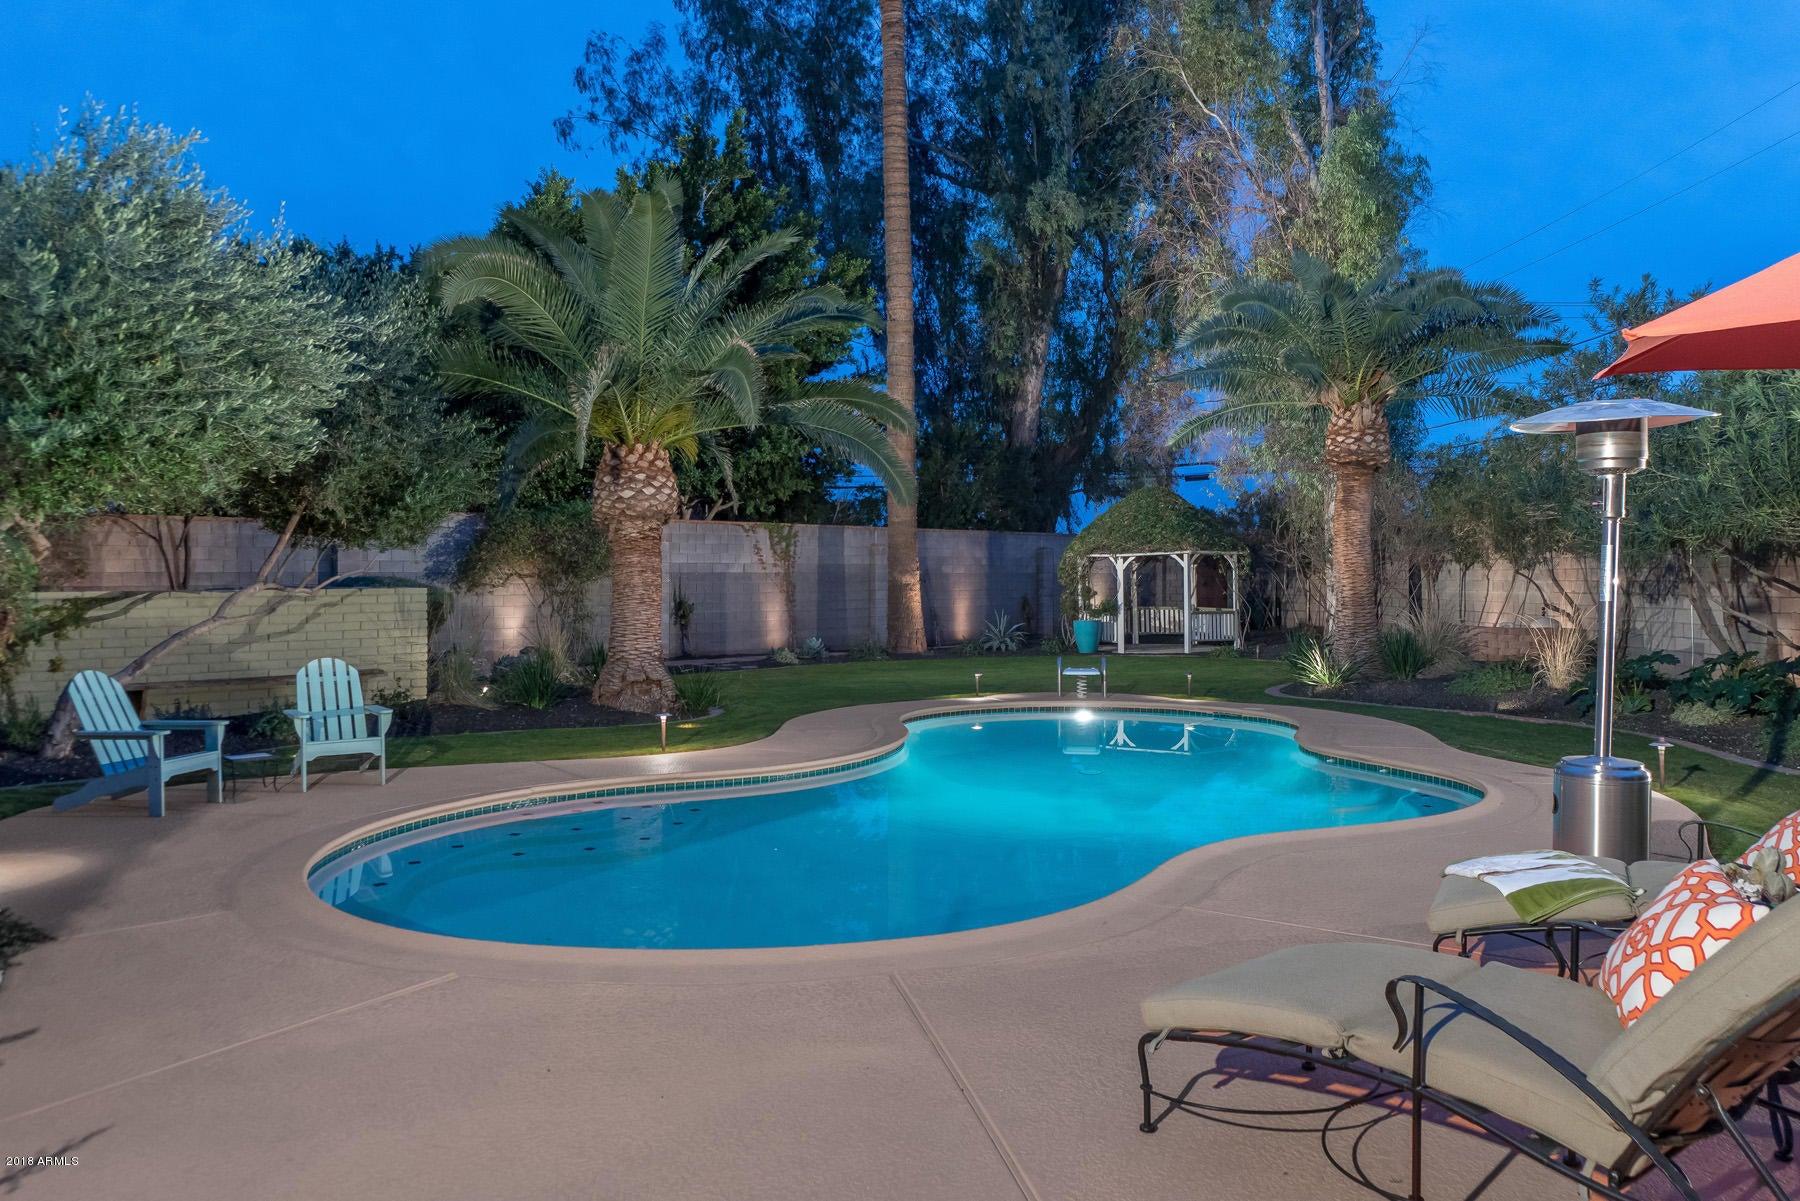 Additional photo for property listing at 1628 N Palmcroft Way Sw 1628 N Palmcroft Way Sw Phoenix, Arizona,85007 United States